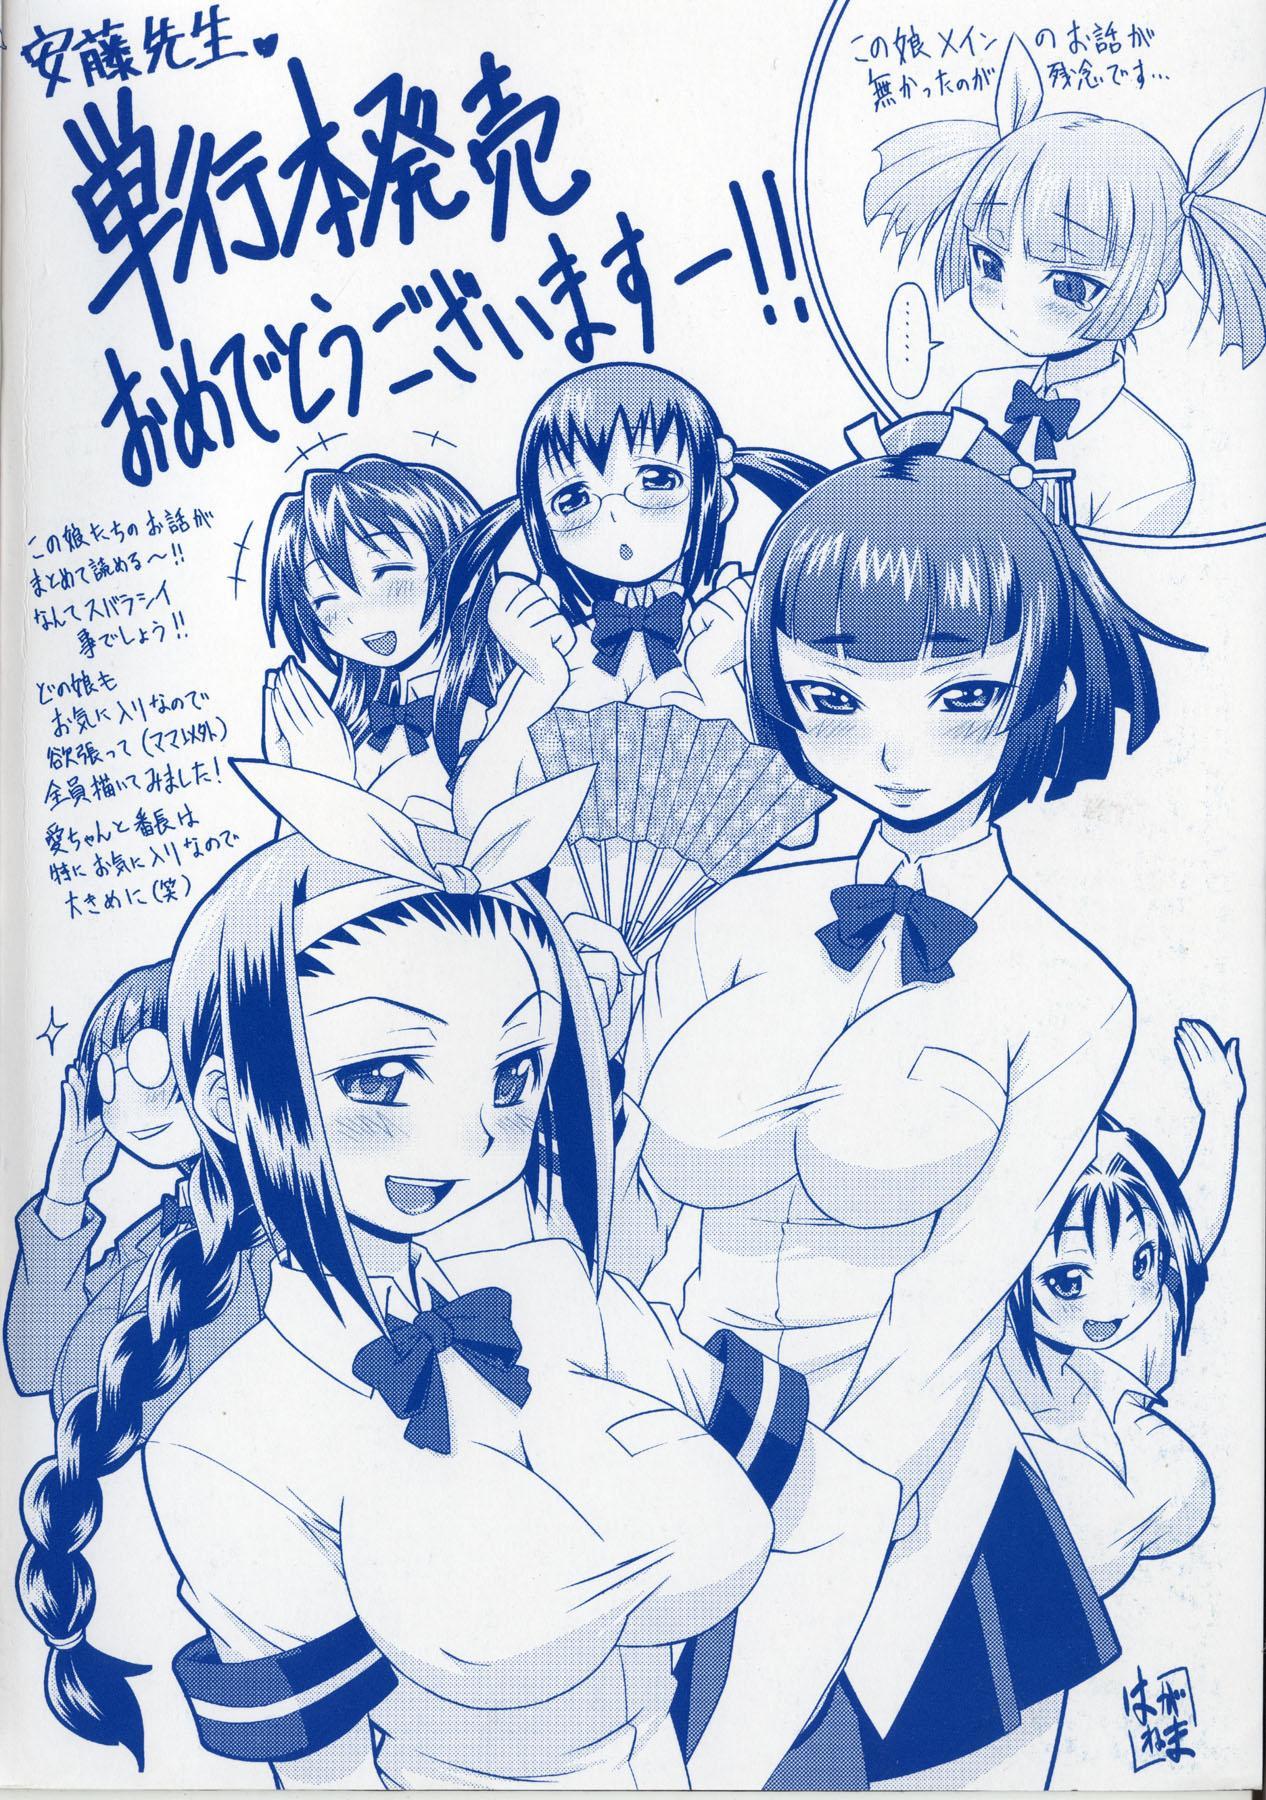 [Ando Hiroyuki] Koisuru Purin-Pai - Pudding-Pai Falling in Love [English] [Kusanyagi, Team Vanilla] 2